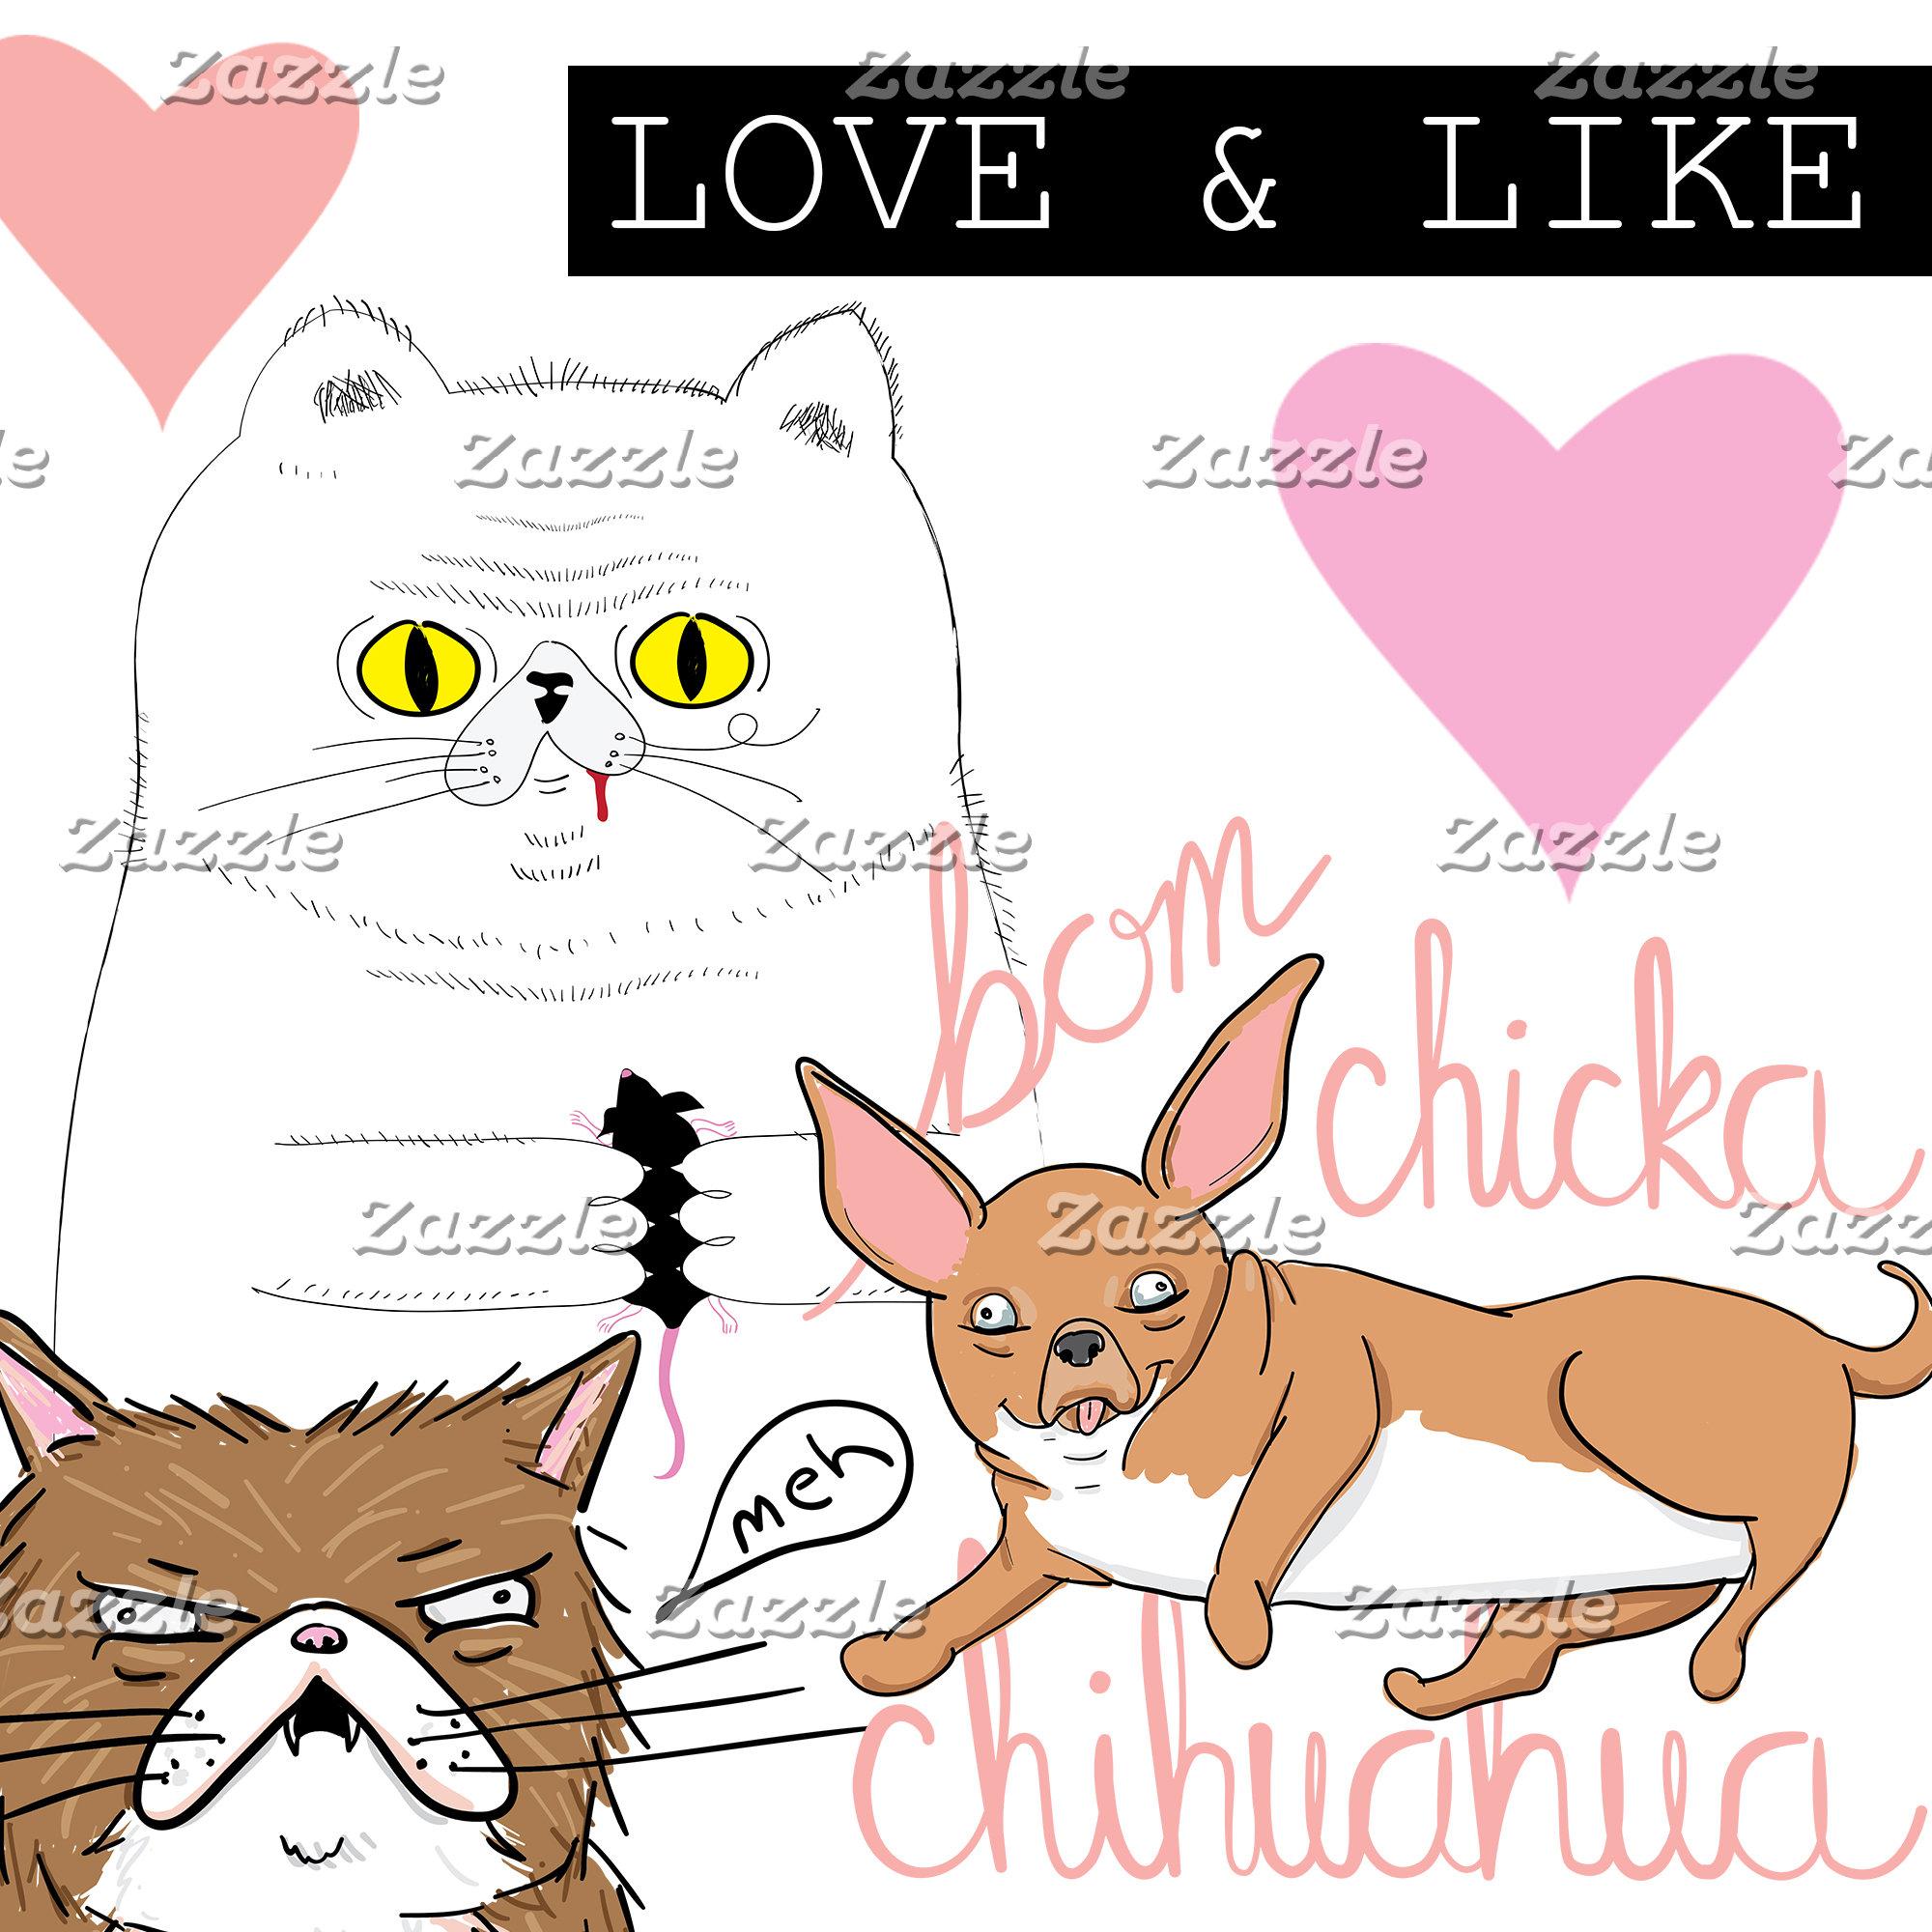 Love & Like